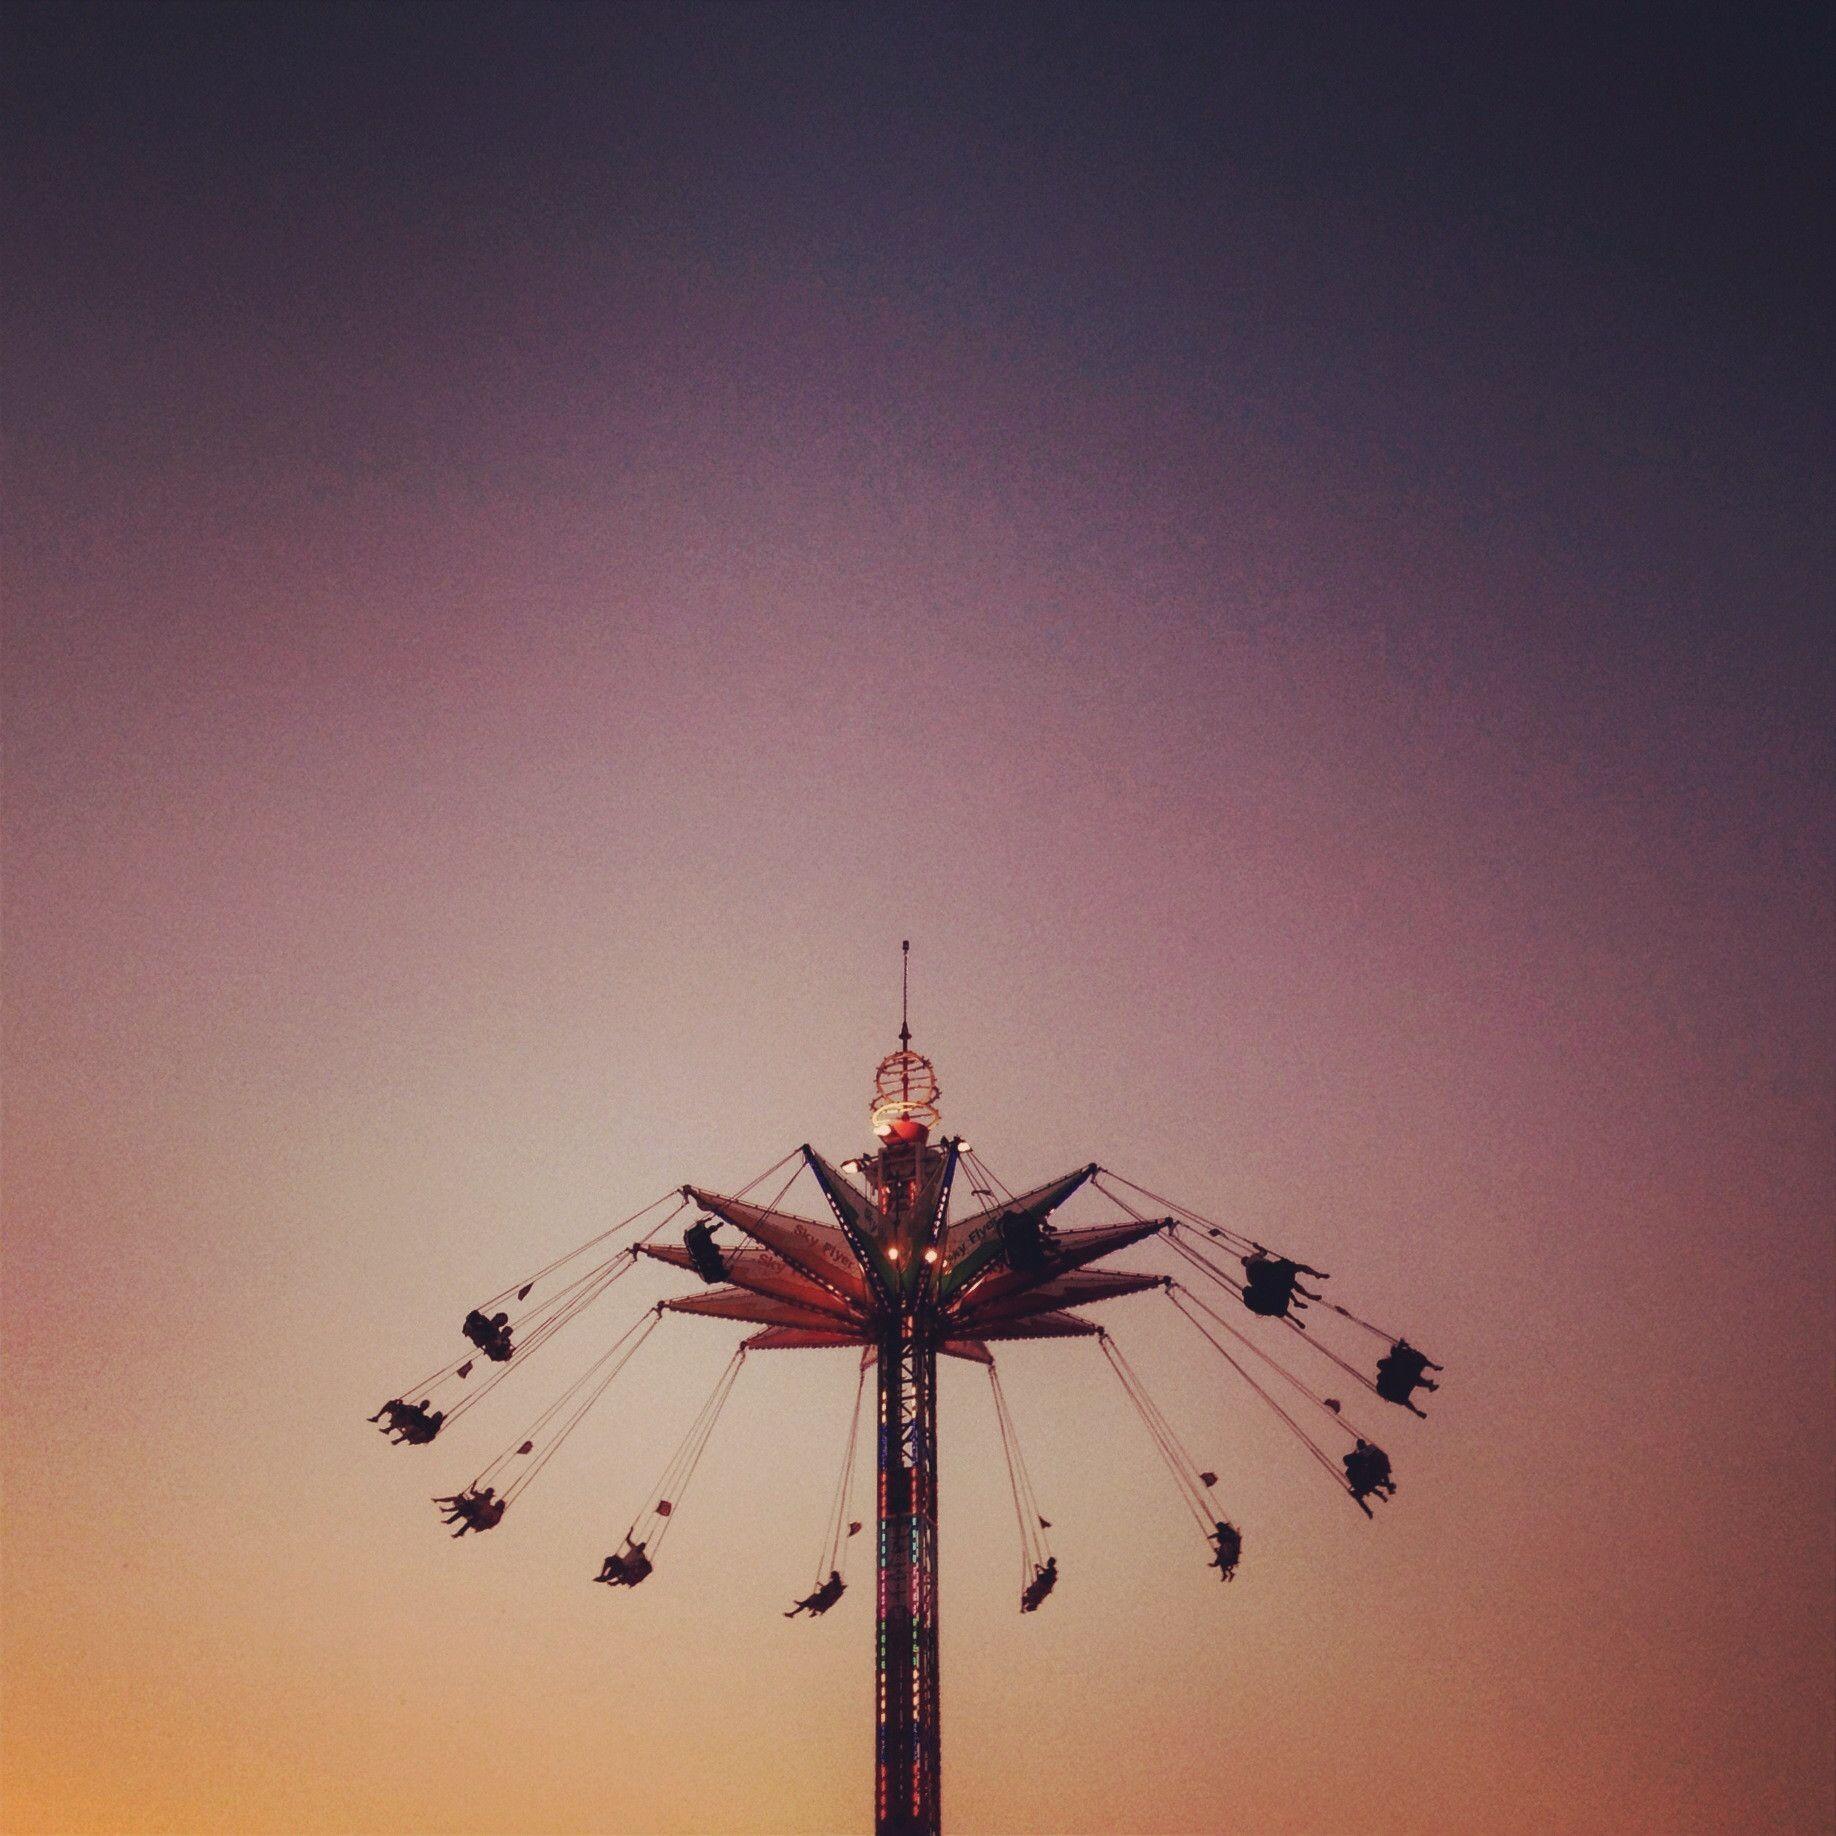 Swinging Through the Air 2